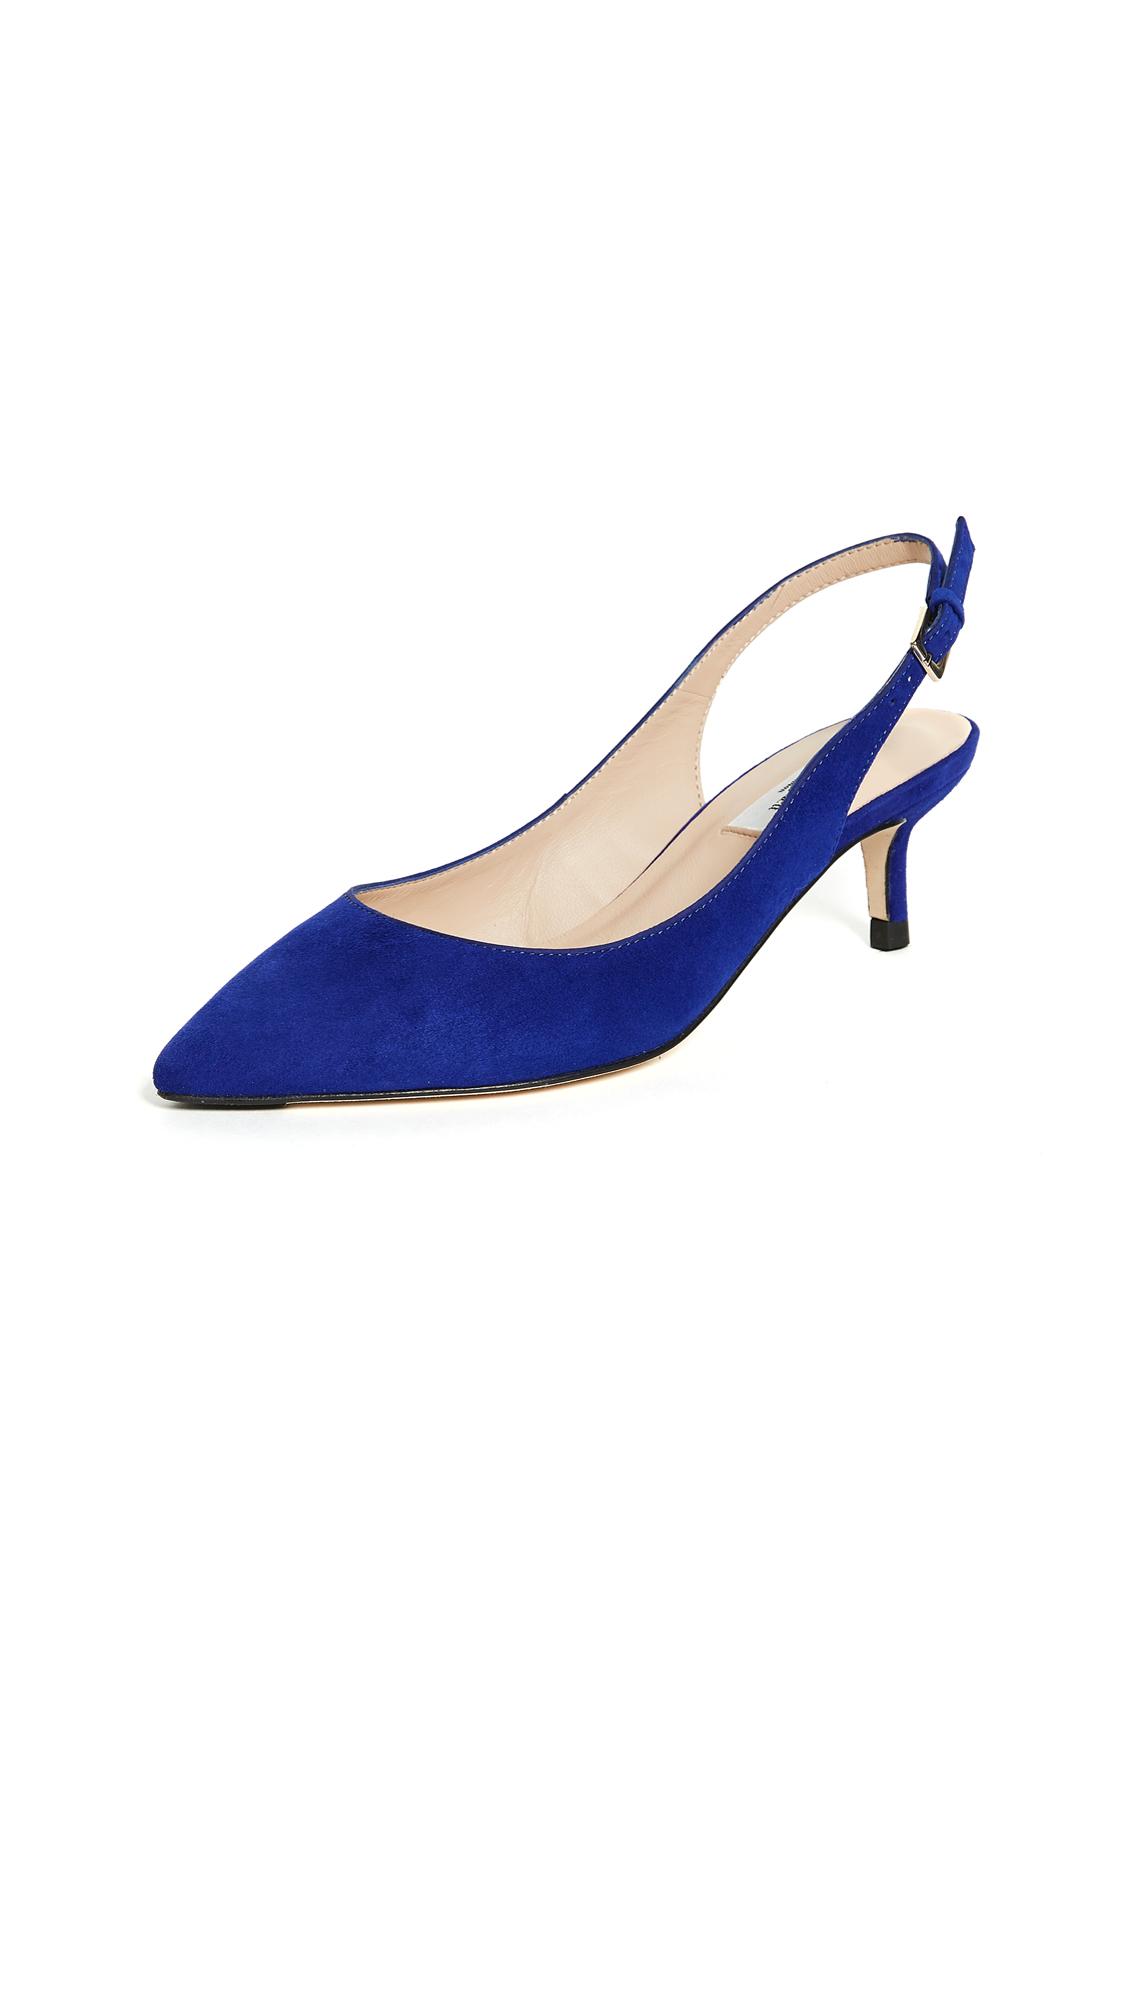 L.K. Bennett Ava Slingback Pumps - Ultra Blue